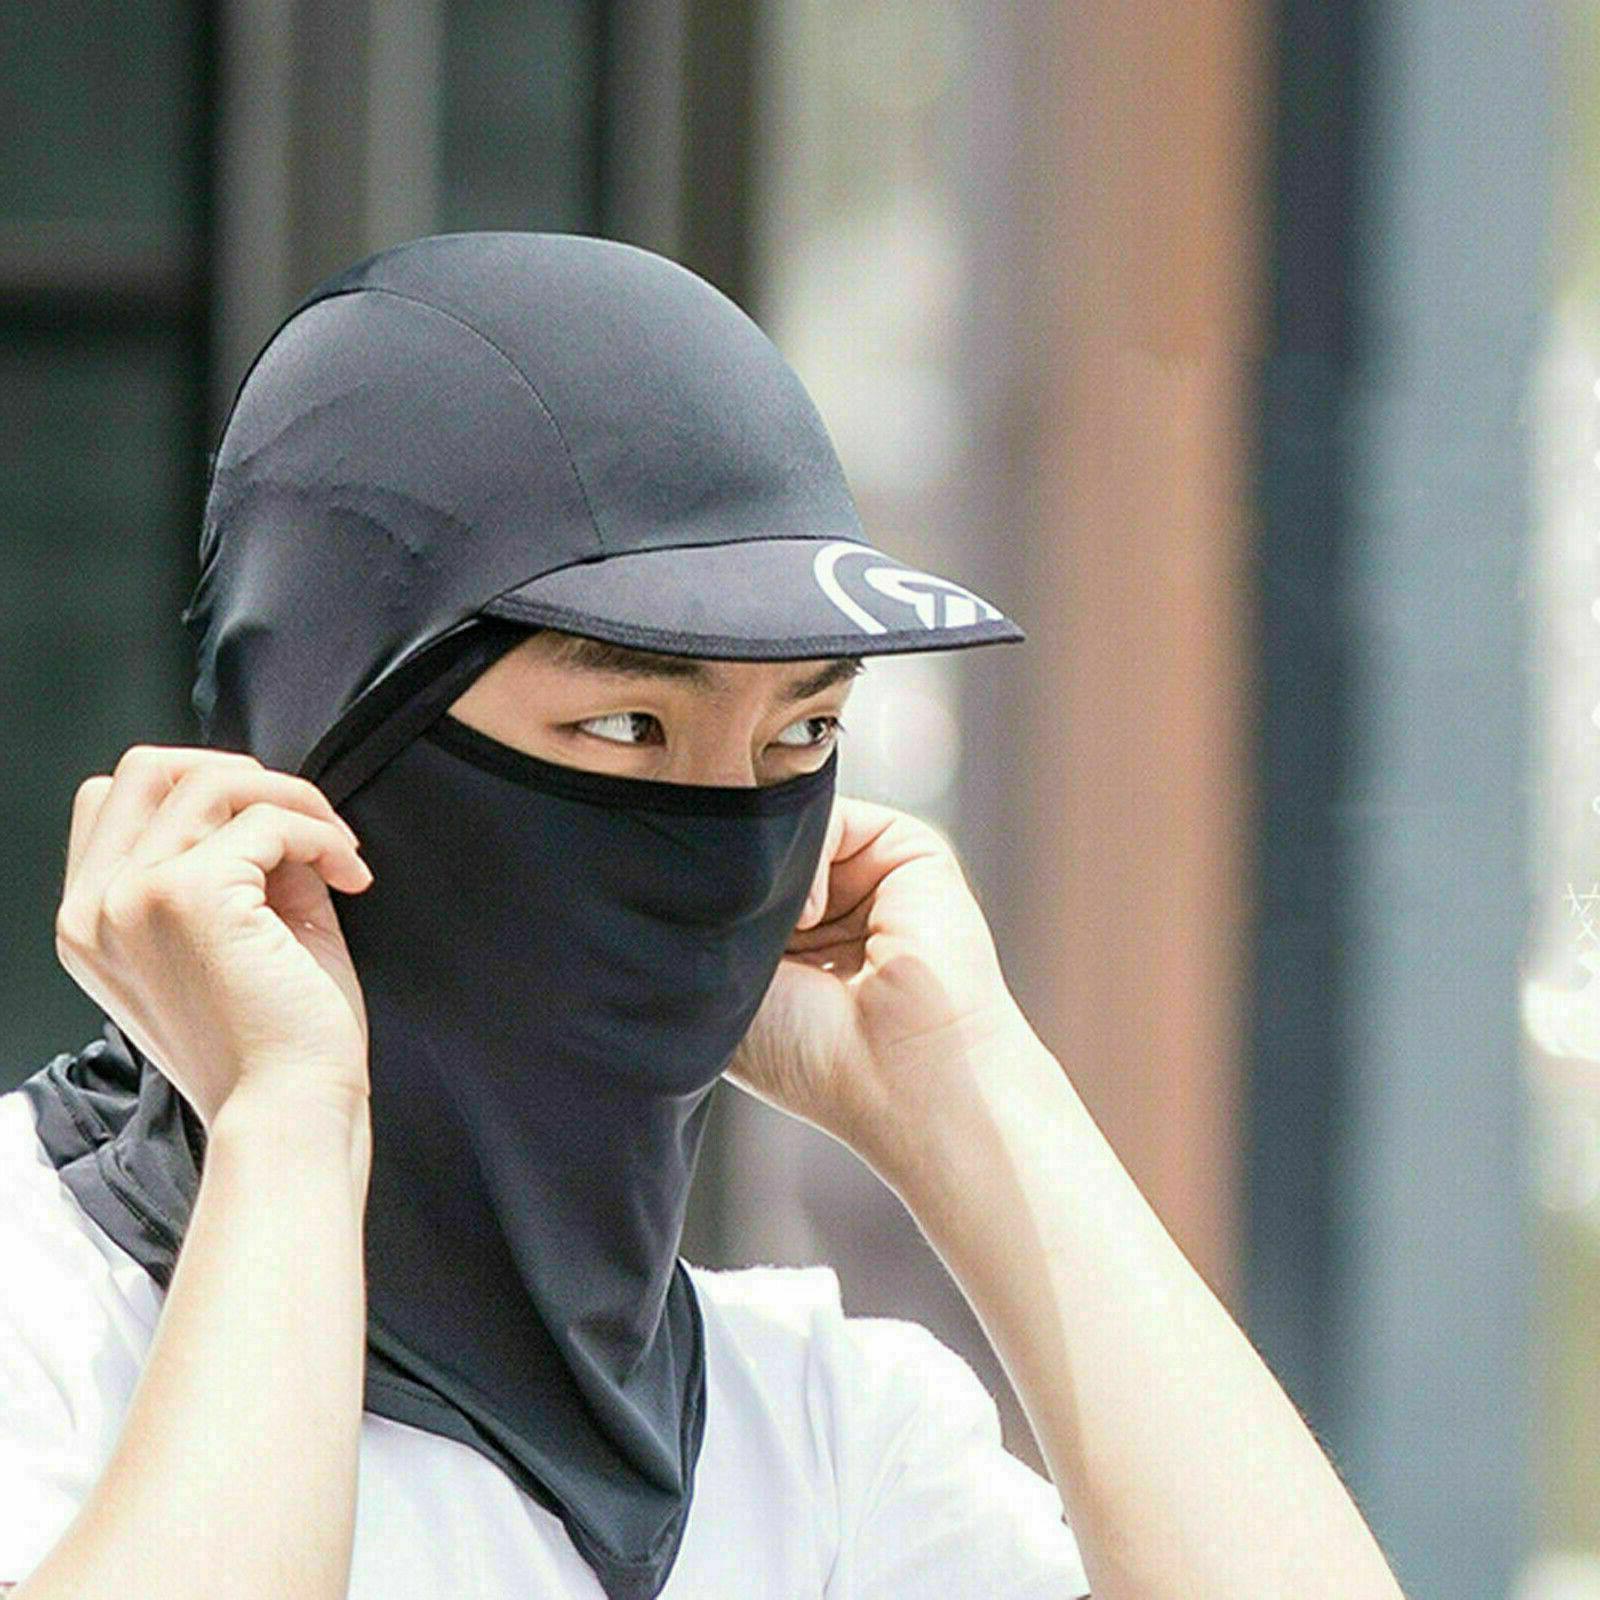 RockBros Silk Headgear Absorbing and Quick-drying Mask